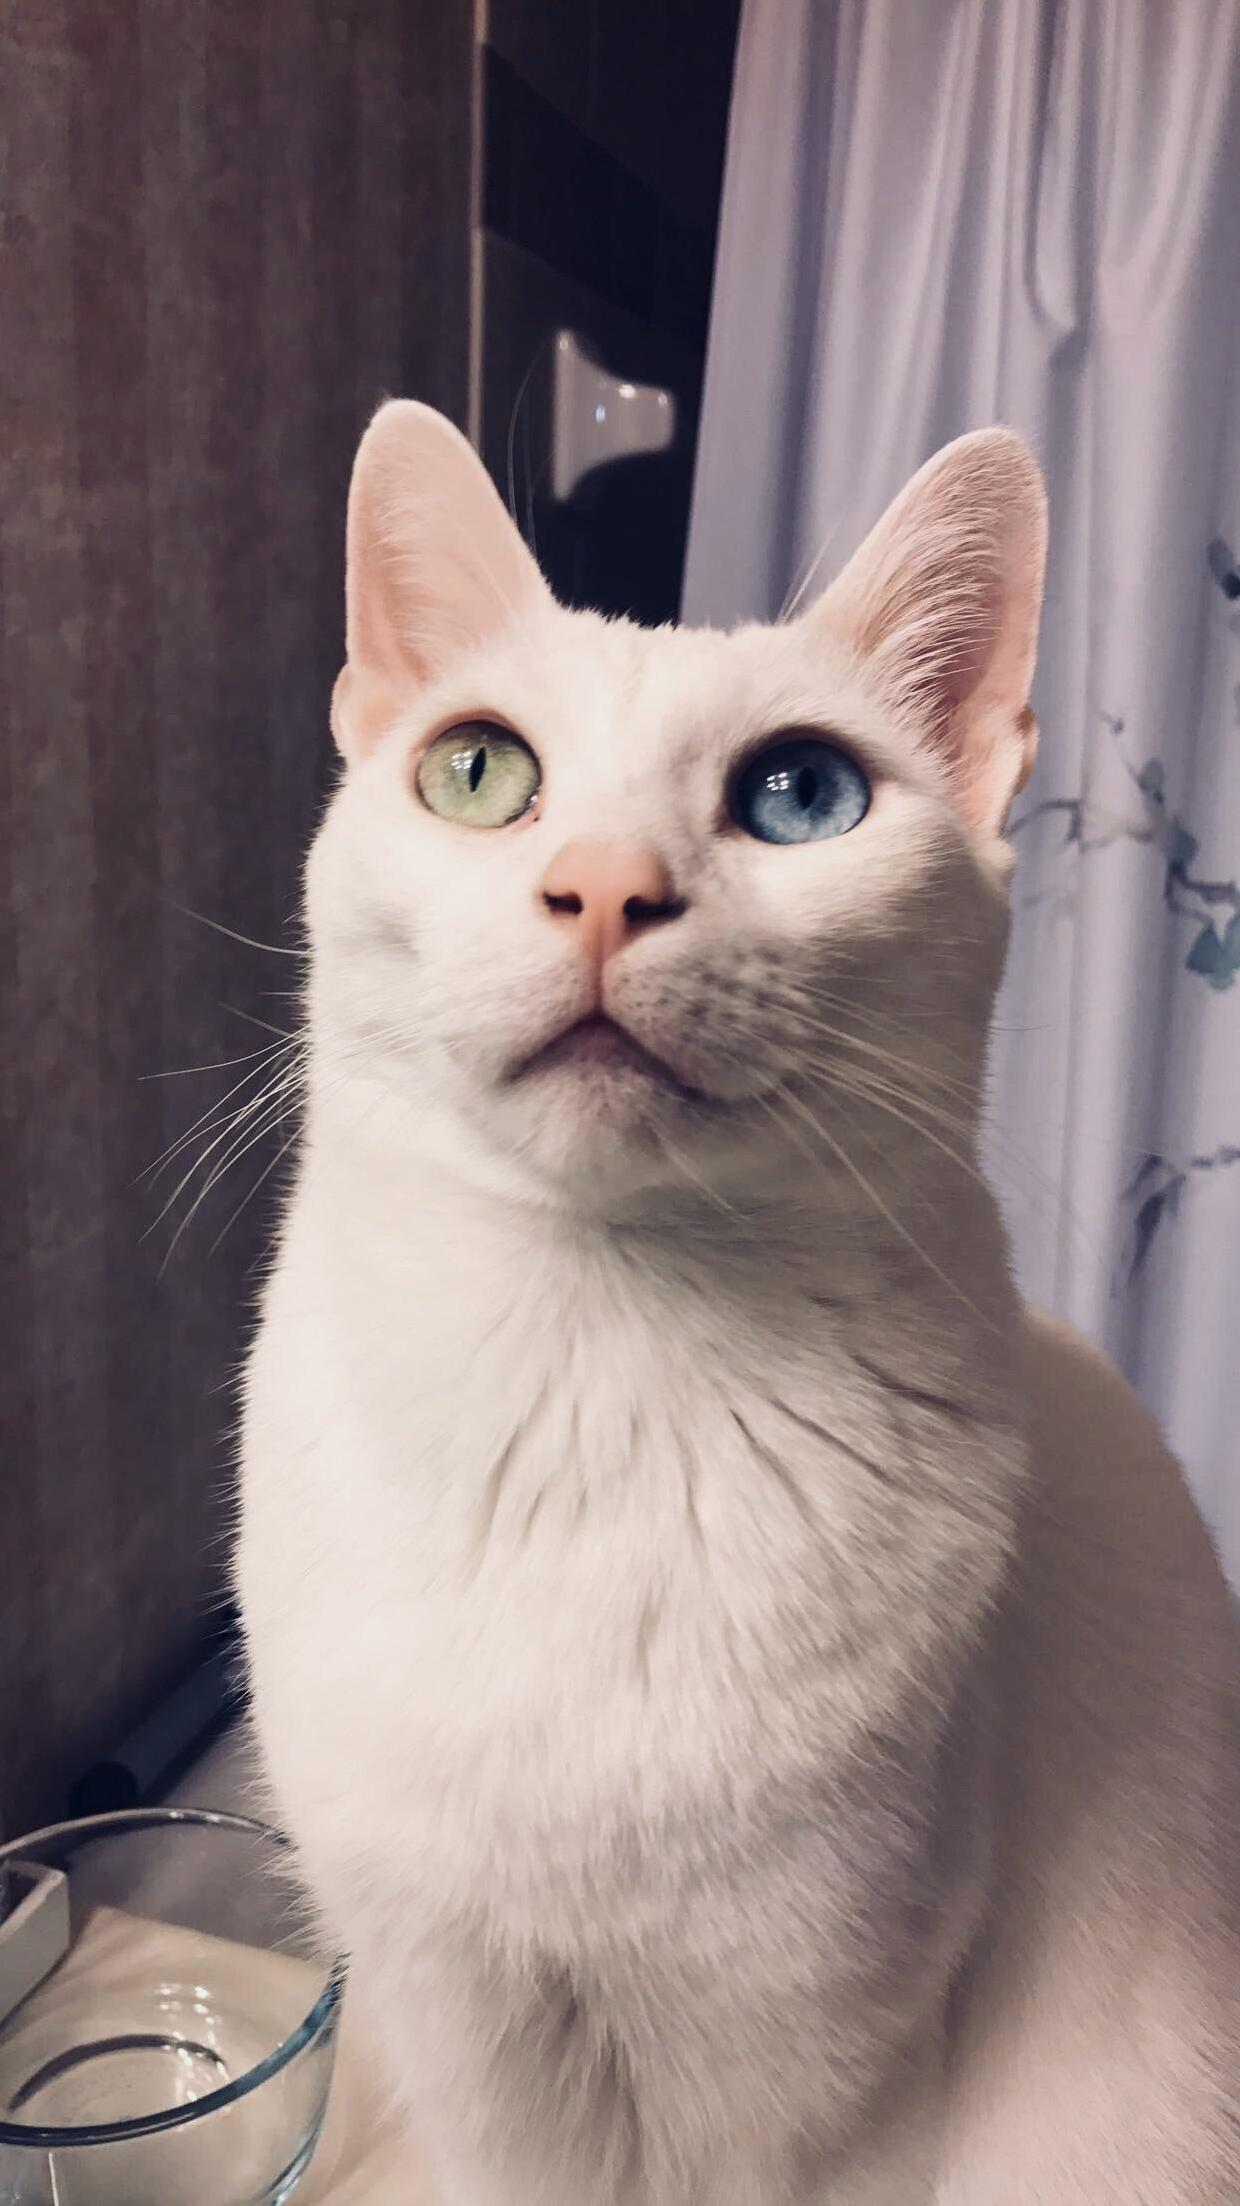 Tucker has heterochromia